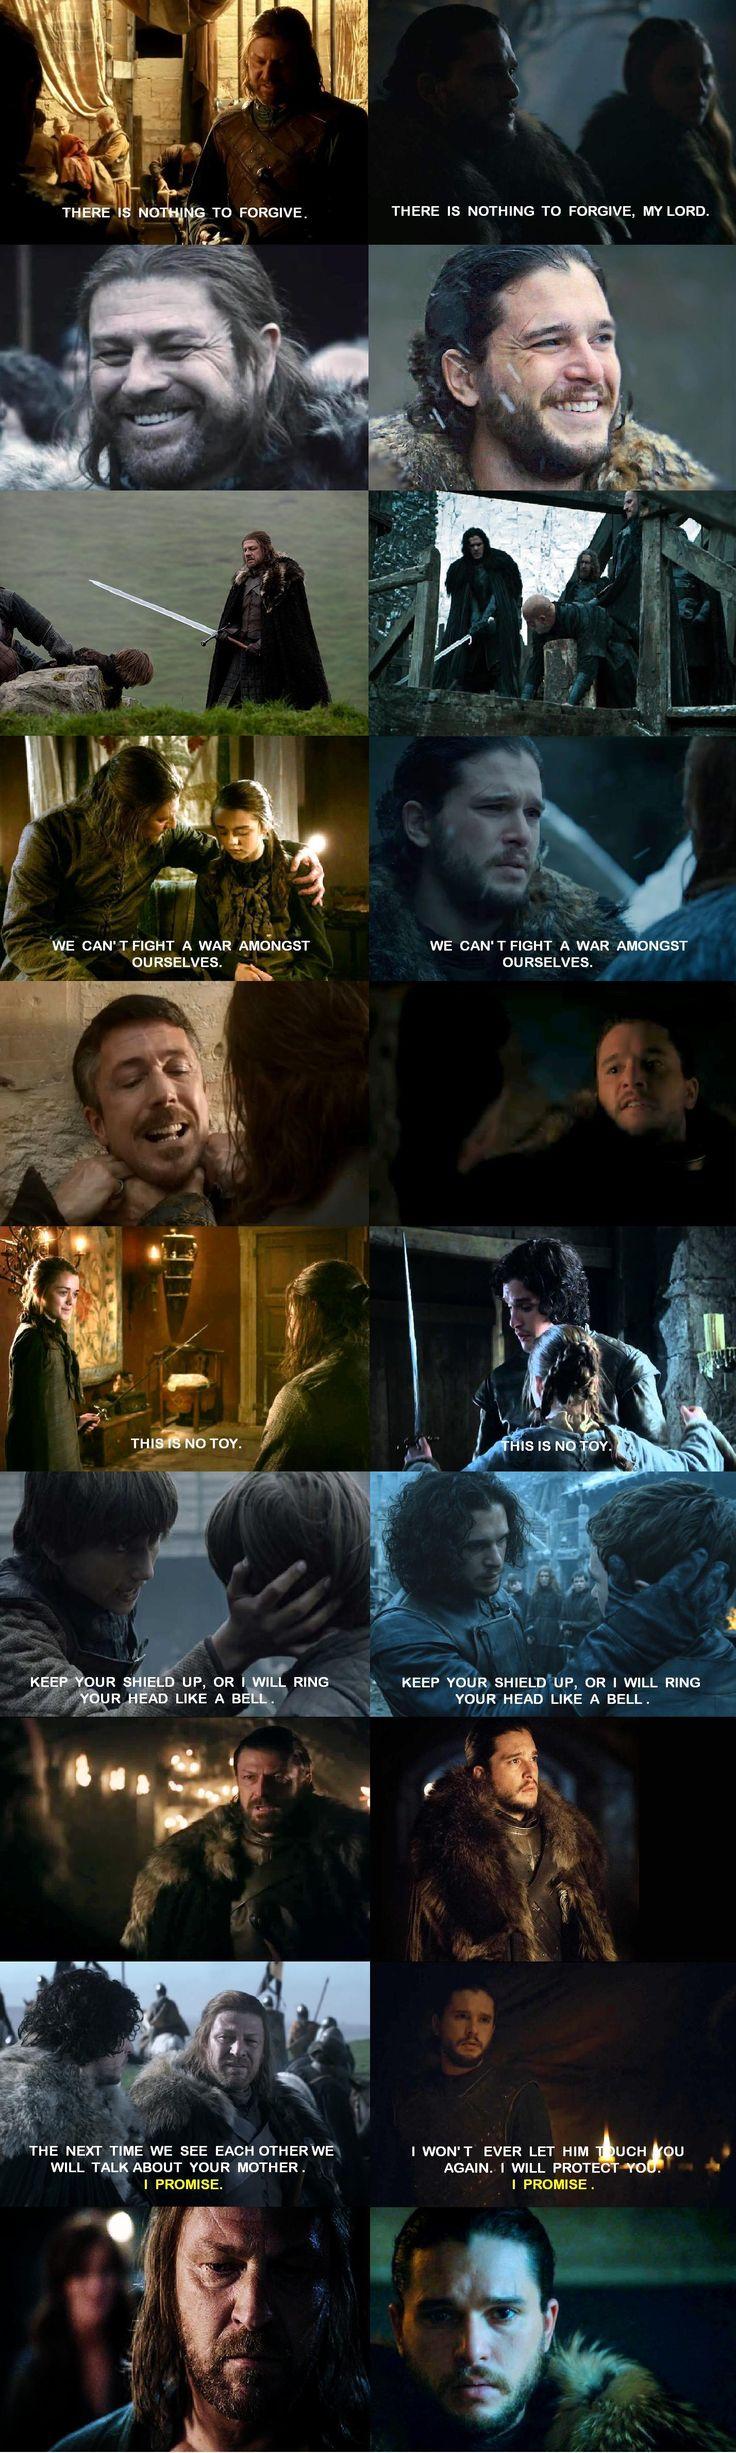 Jon Snow and Ned Stark Similarities on Game of Thrones...